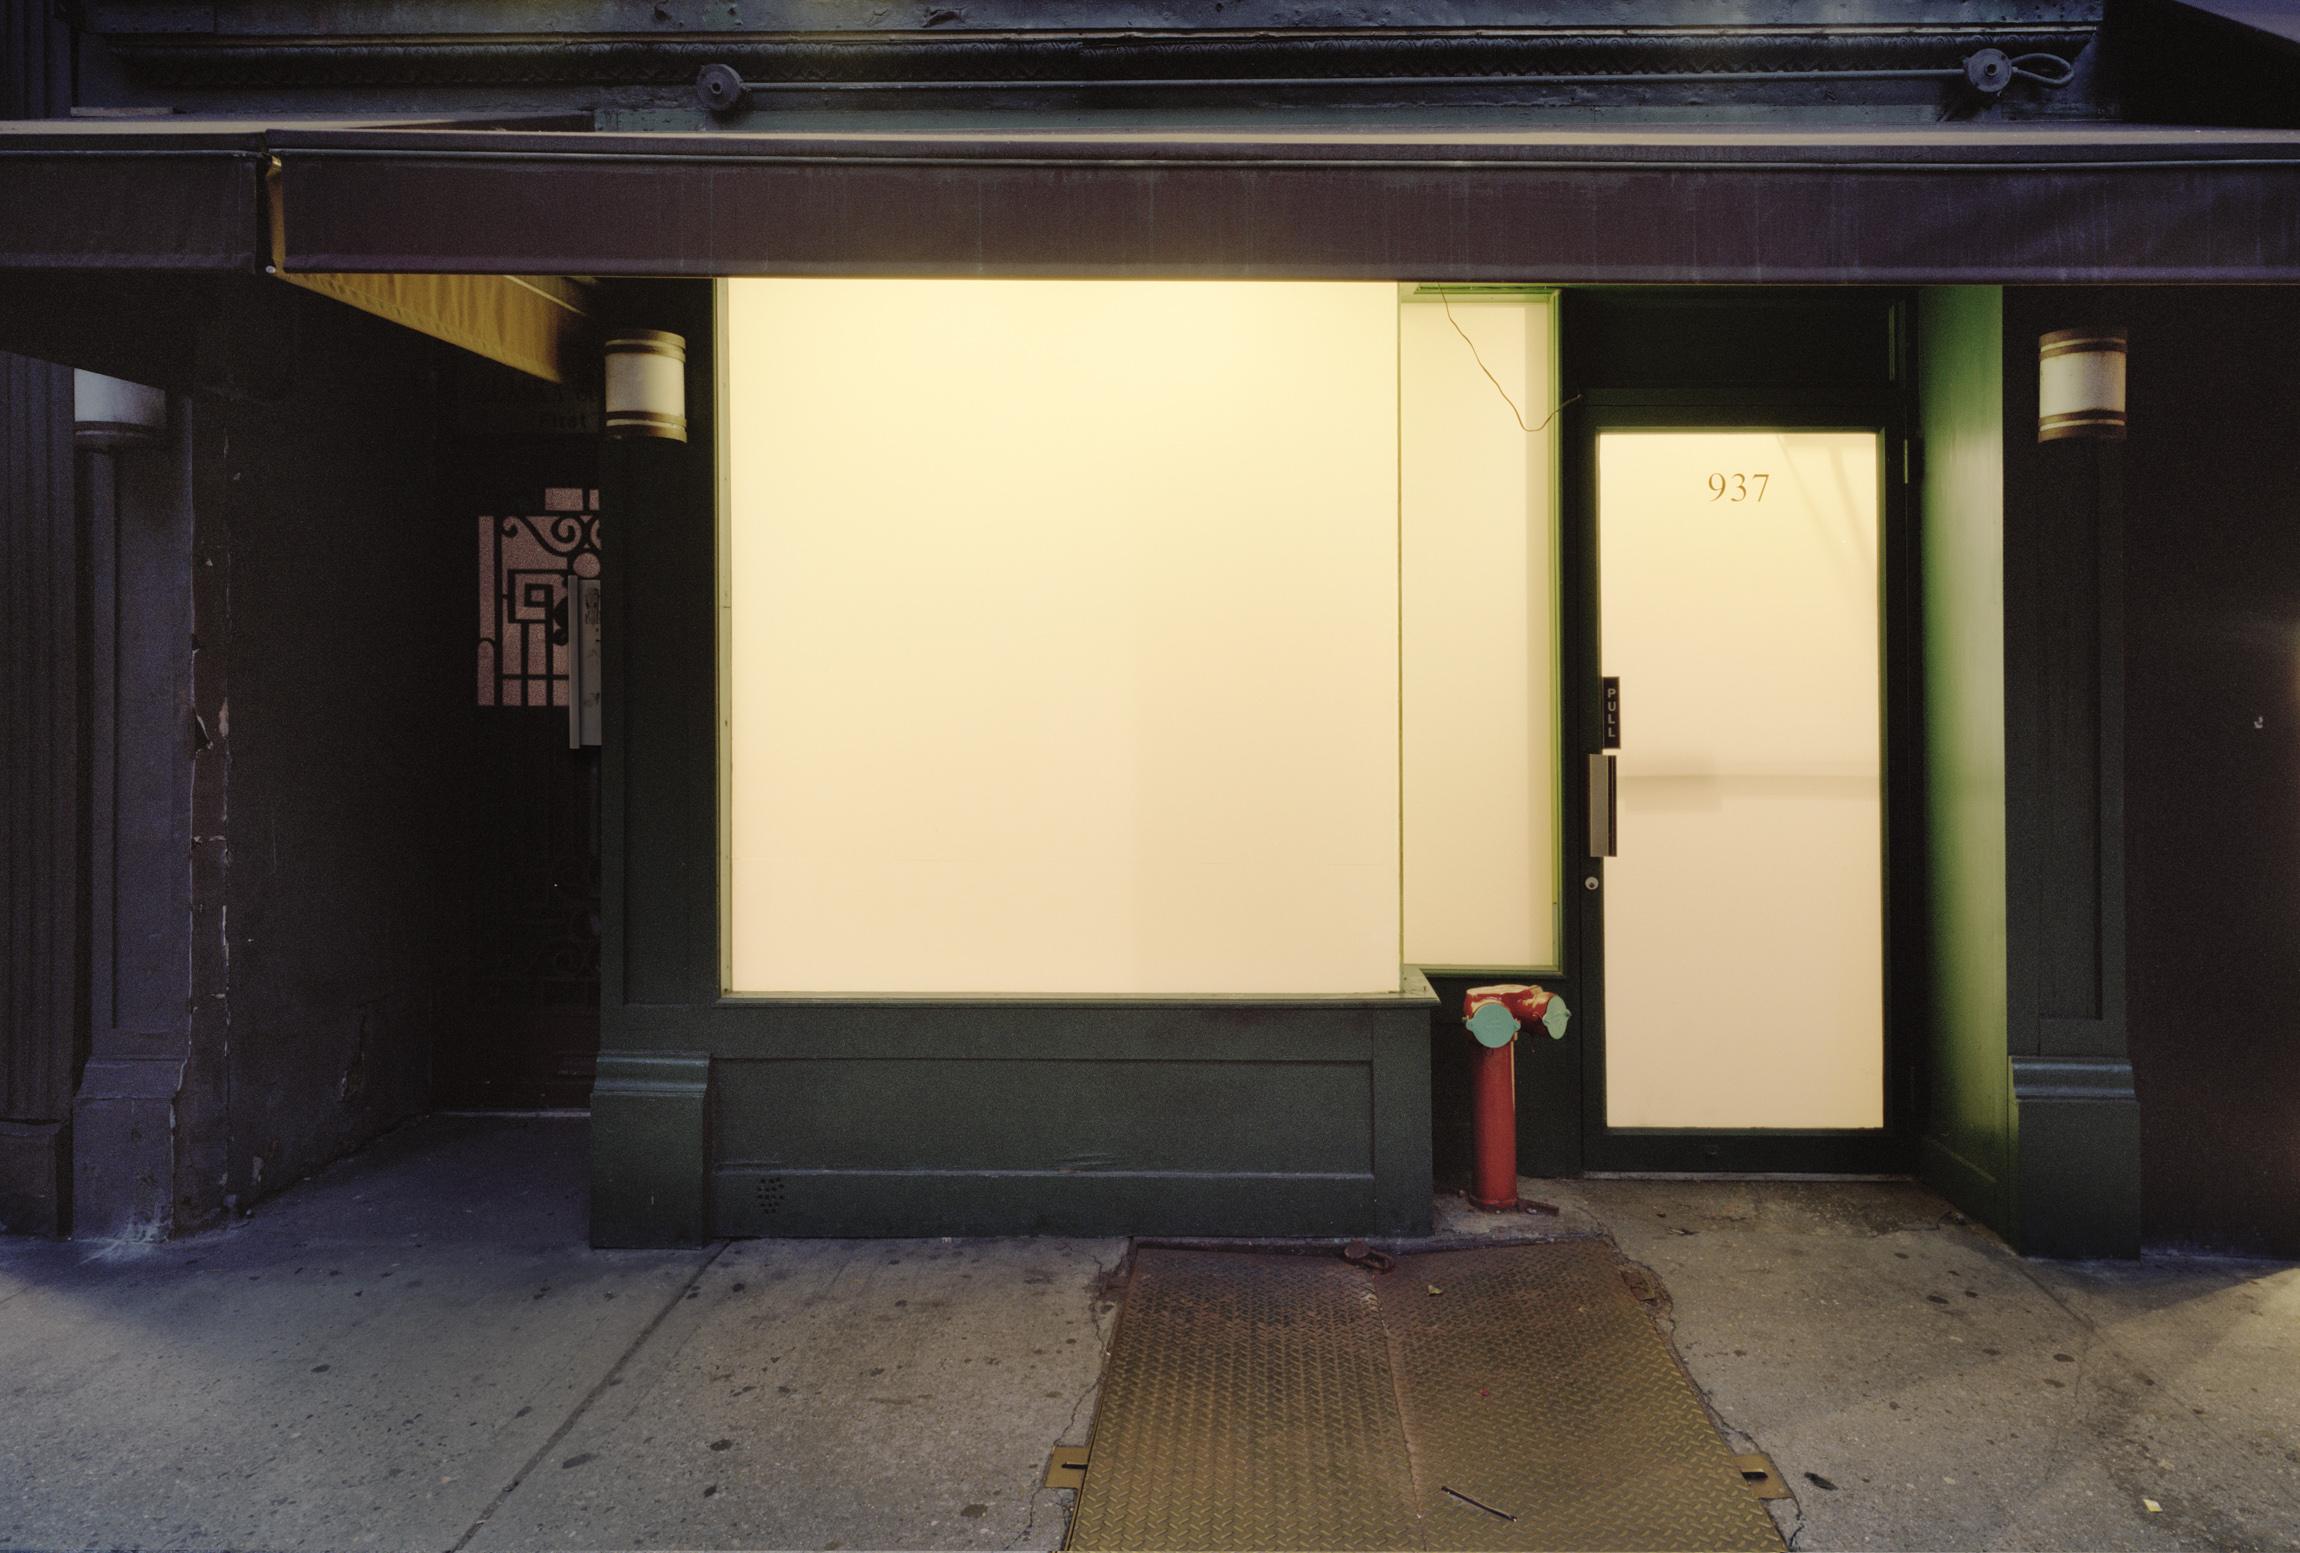 Lighted Windows - New York, New York